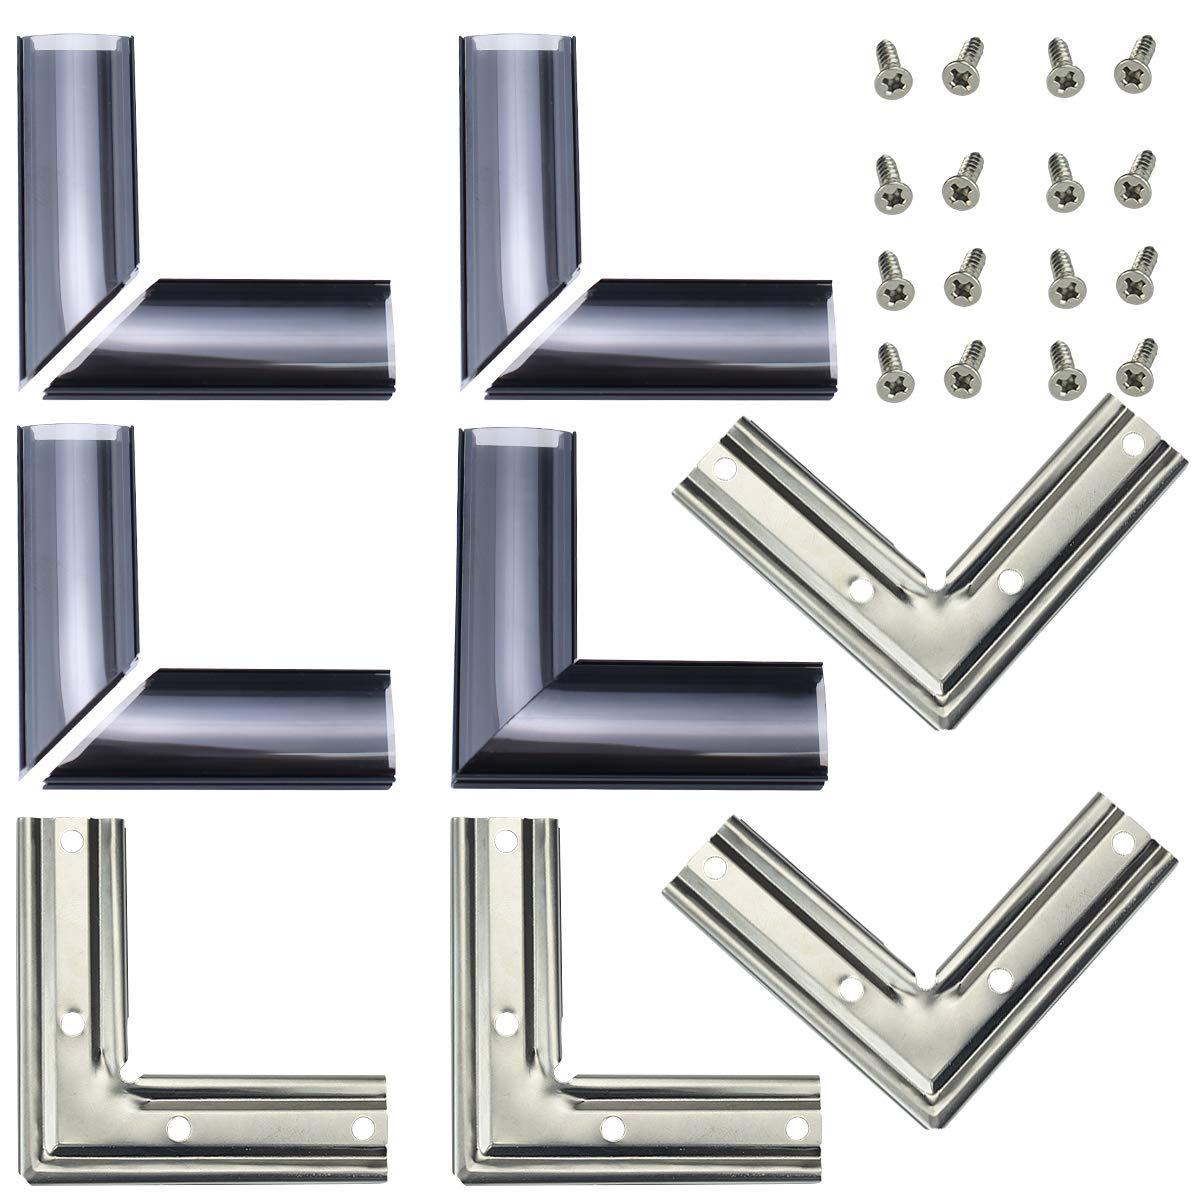 Muzata L-Shape Adaptor X4 Pairs and L-Shape Connectors 4PCS for U1SW U-Shape Black U Shape LED Aluminum Channel System with Smoke Clear Cover, Channel Corner kit LCC1 BB C1, LA1 LC1